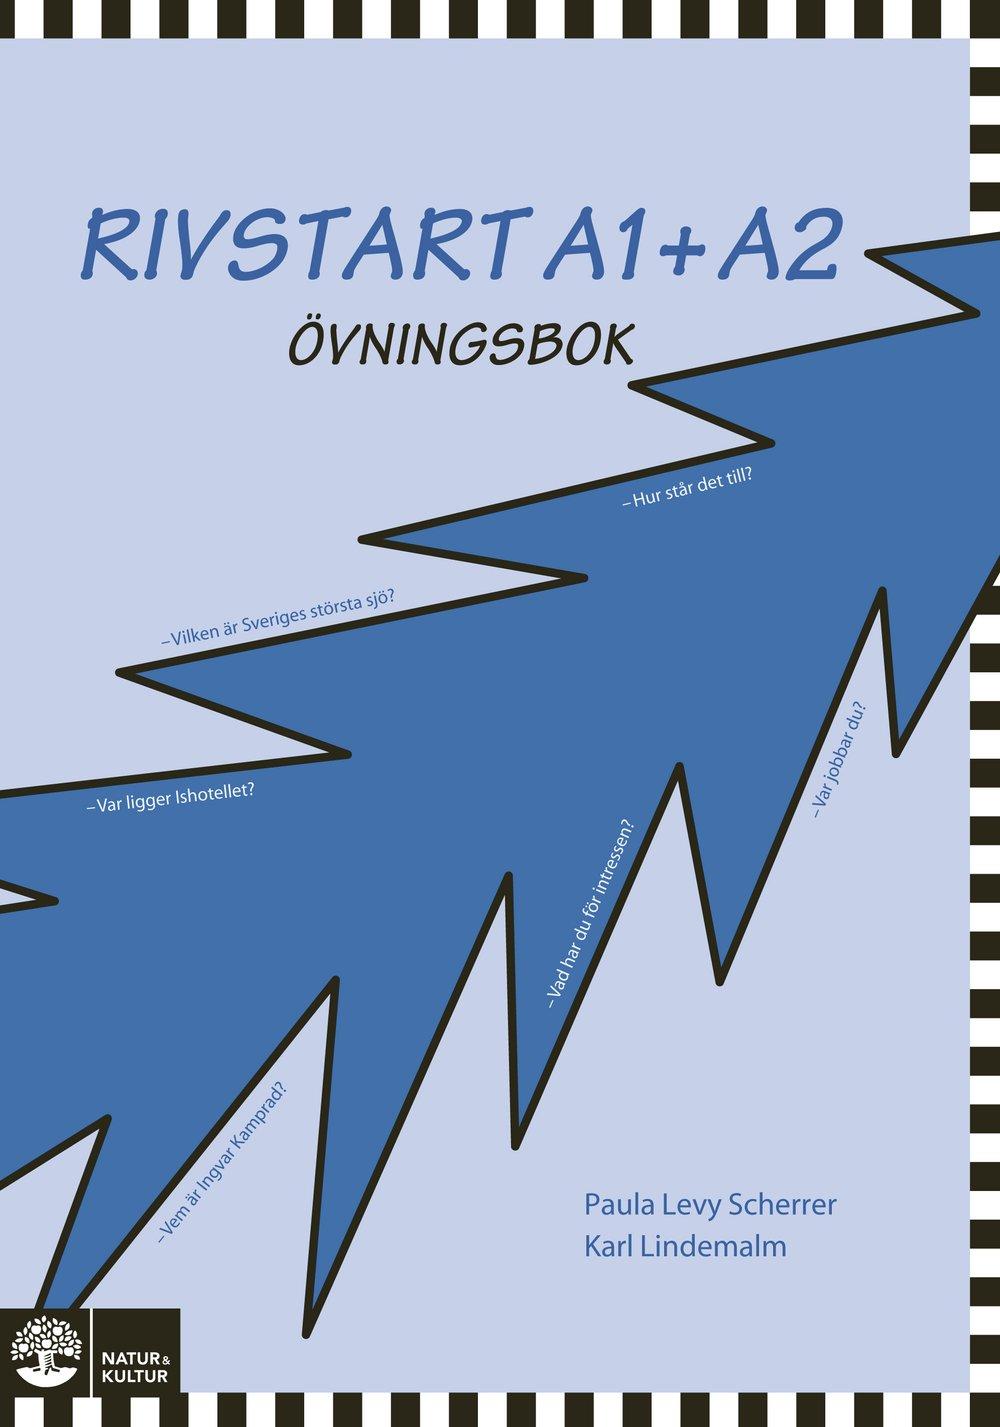 Textbook eBook Digital Download - Textbook eBook PDF Download